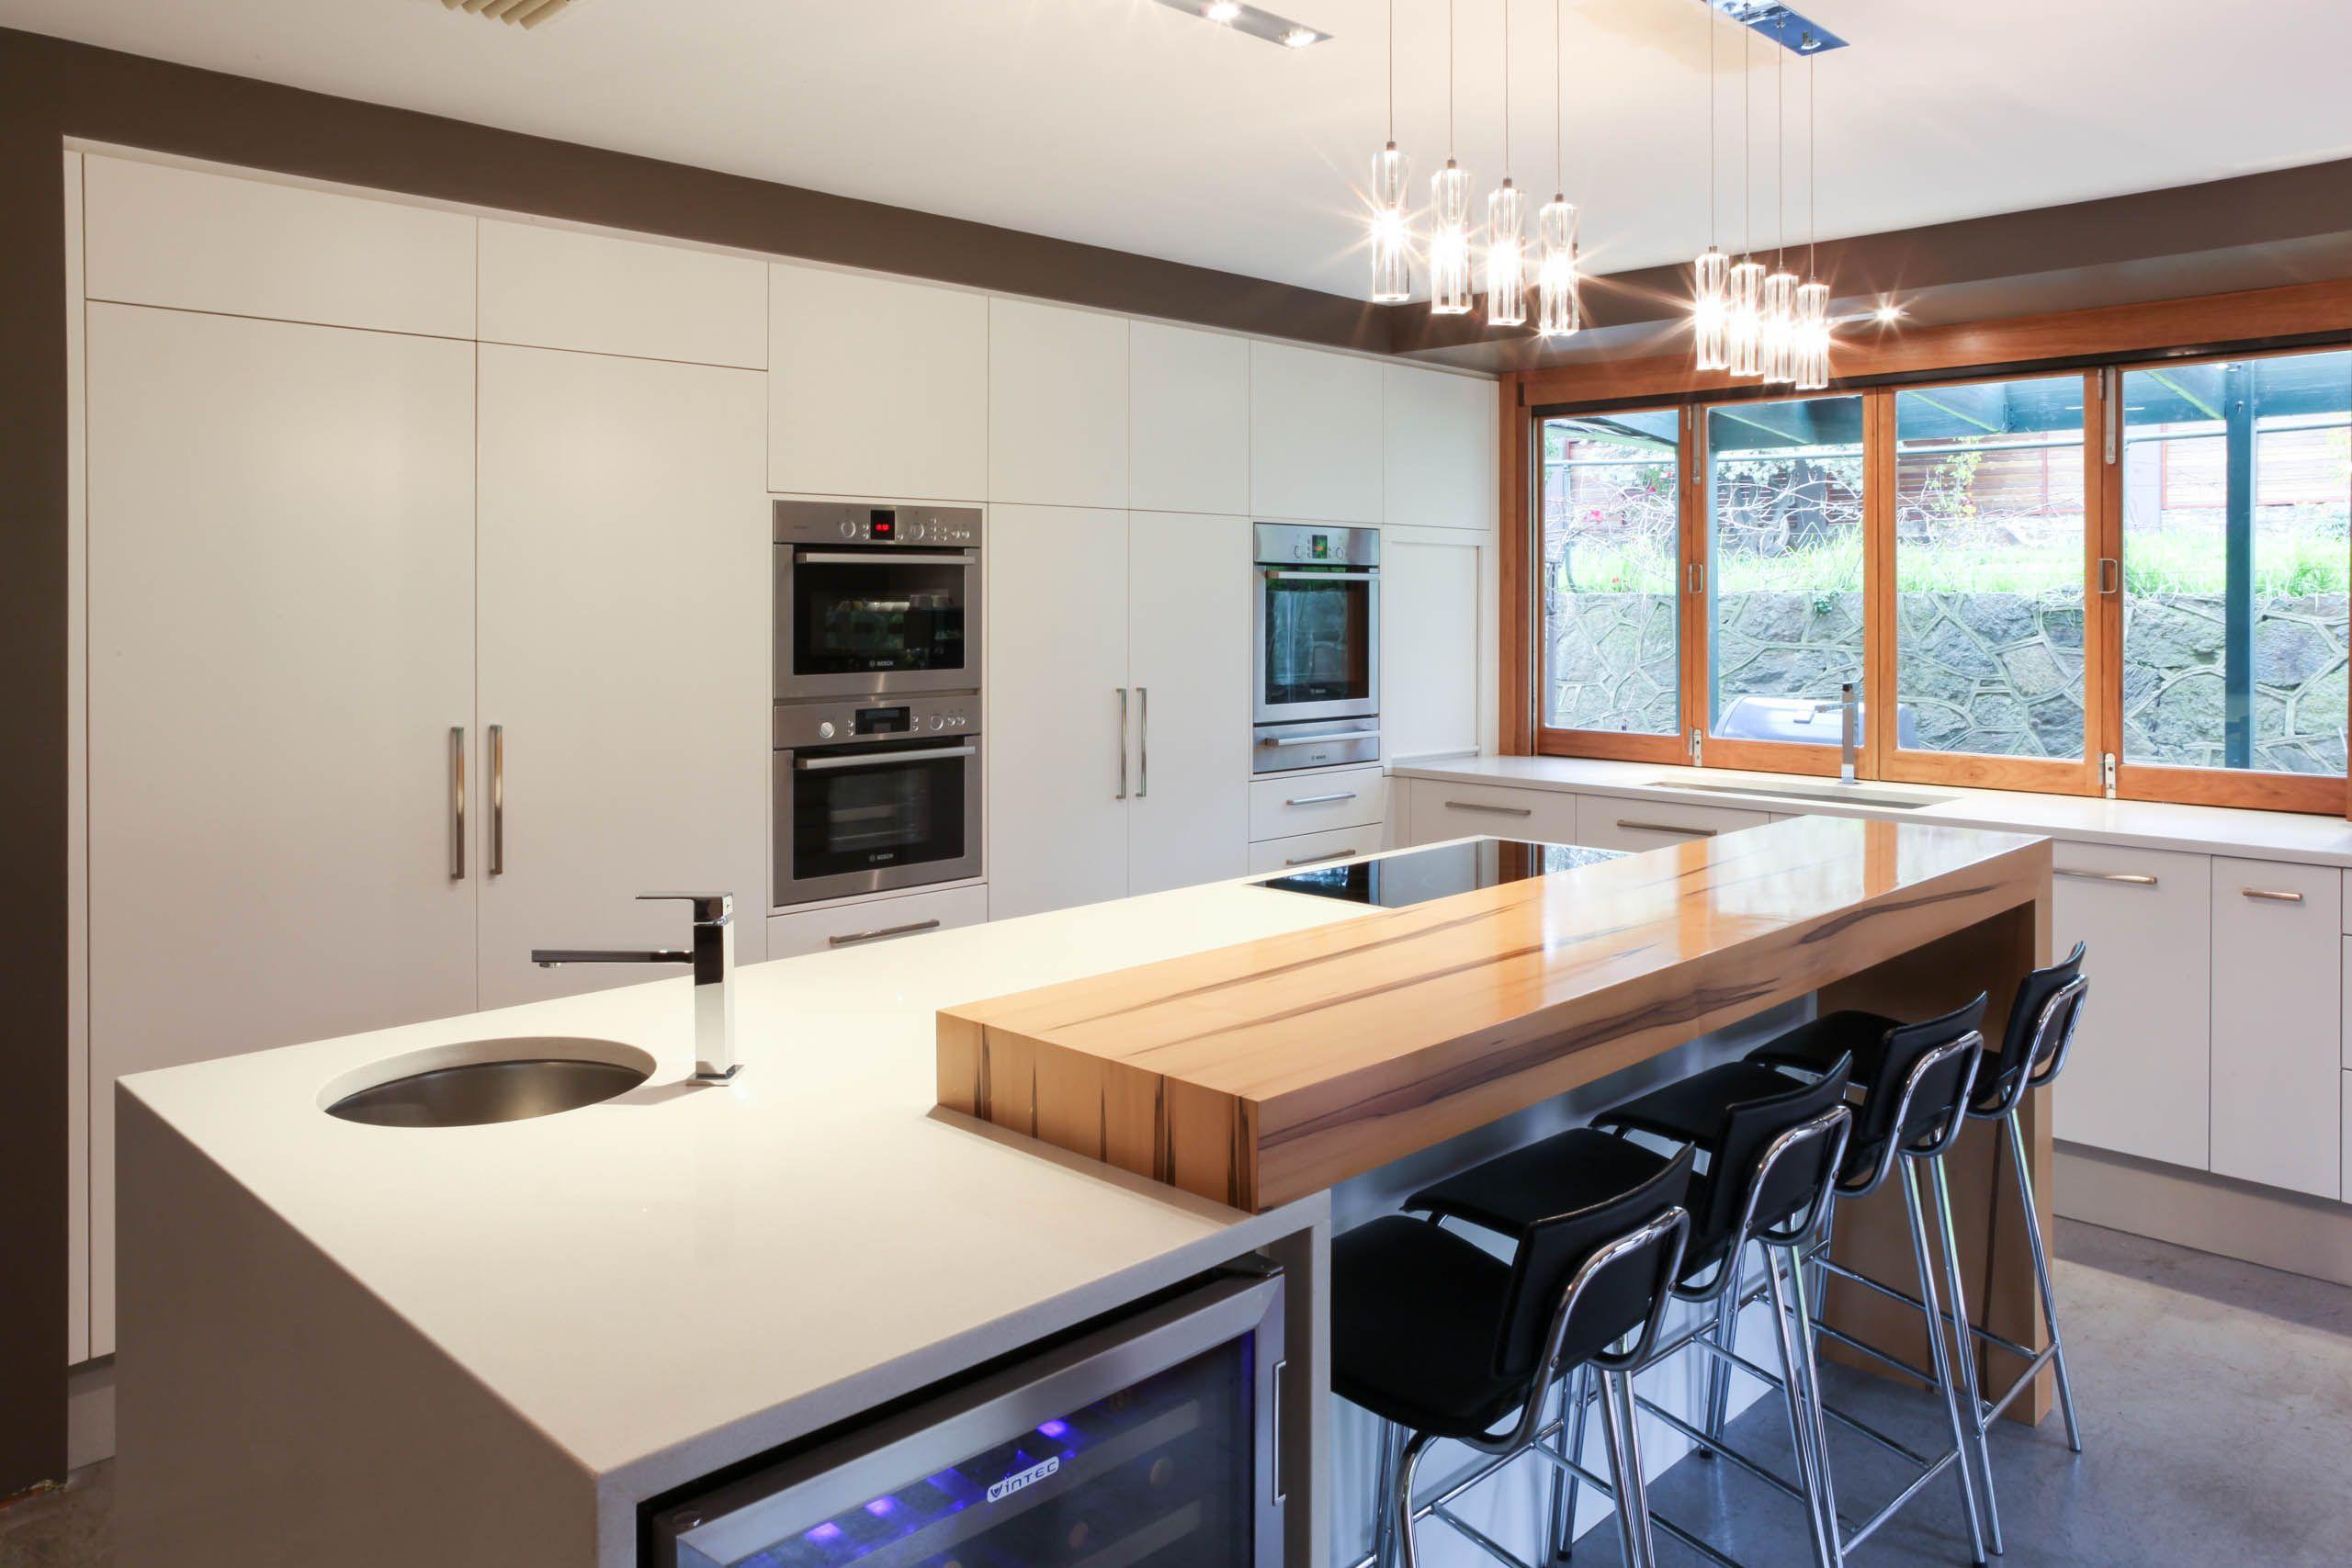 Farquhar Kitchens Adelaide Kitchen Photo Gallery Kitchen Design Kitchen Design Trends Kitchen Photos